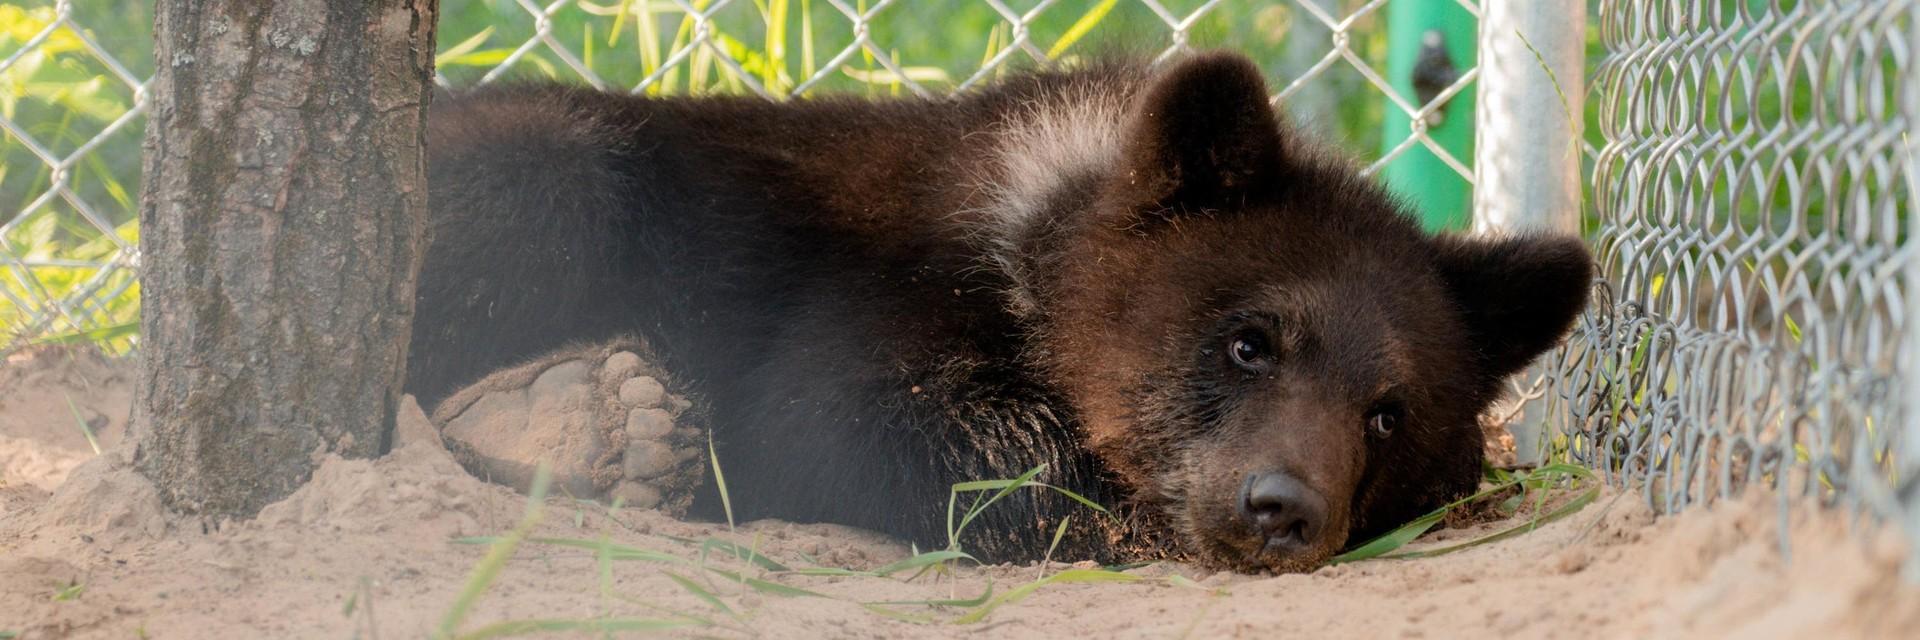 Bear cub Andor